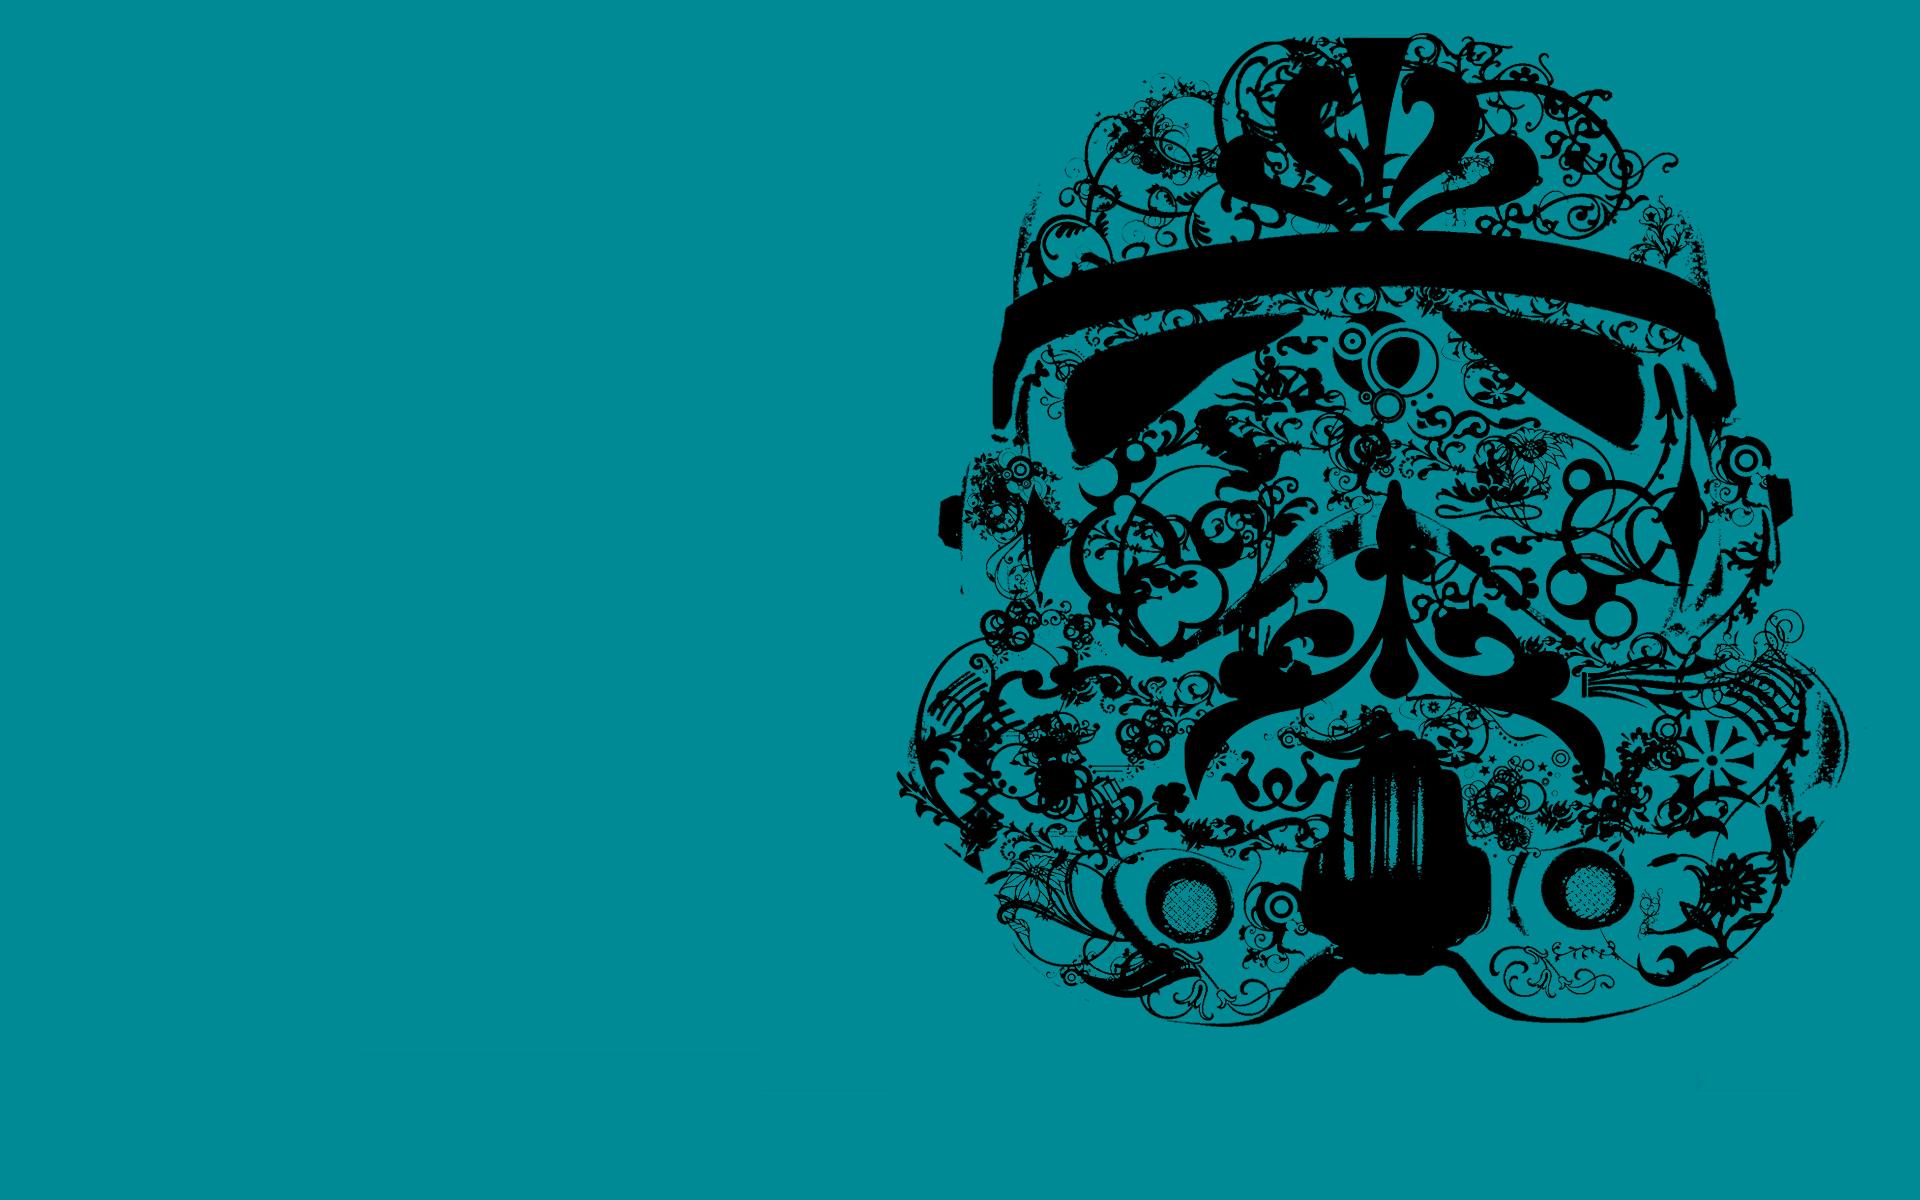 Stormtrooper Wallpaper 1080p Stormtrooper Art Wallpaper 1920x1200